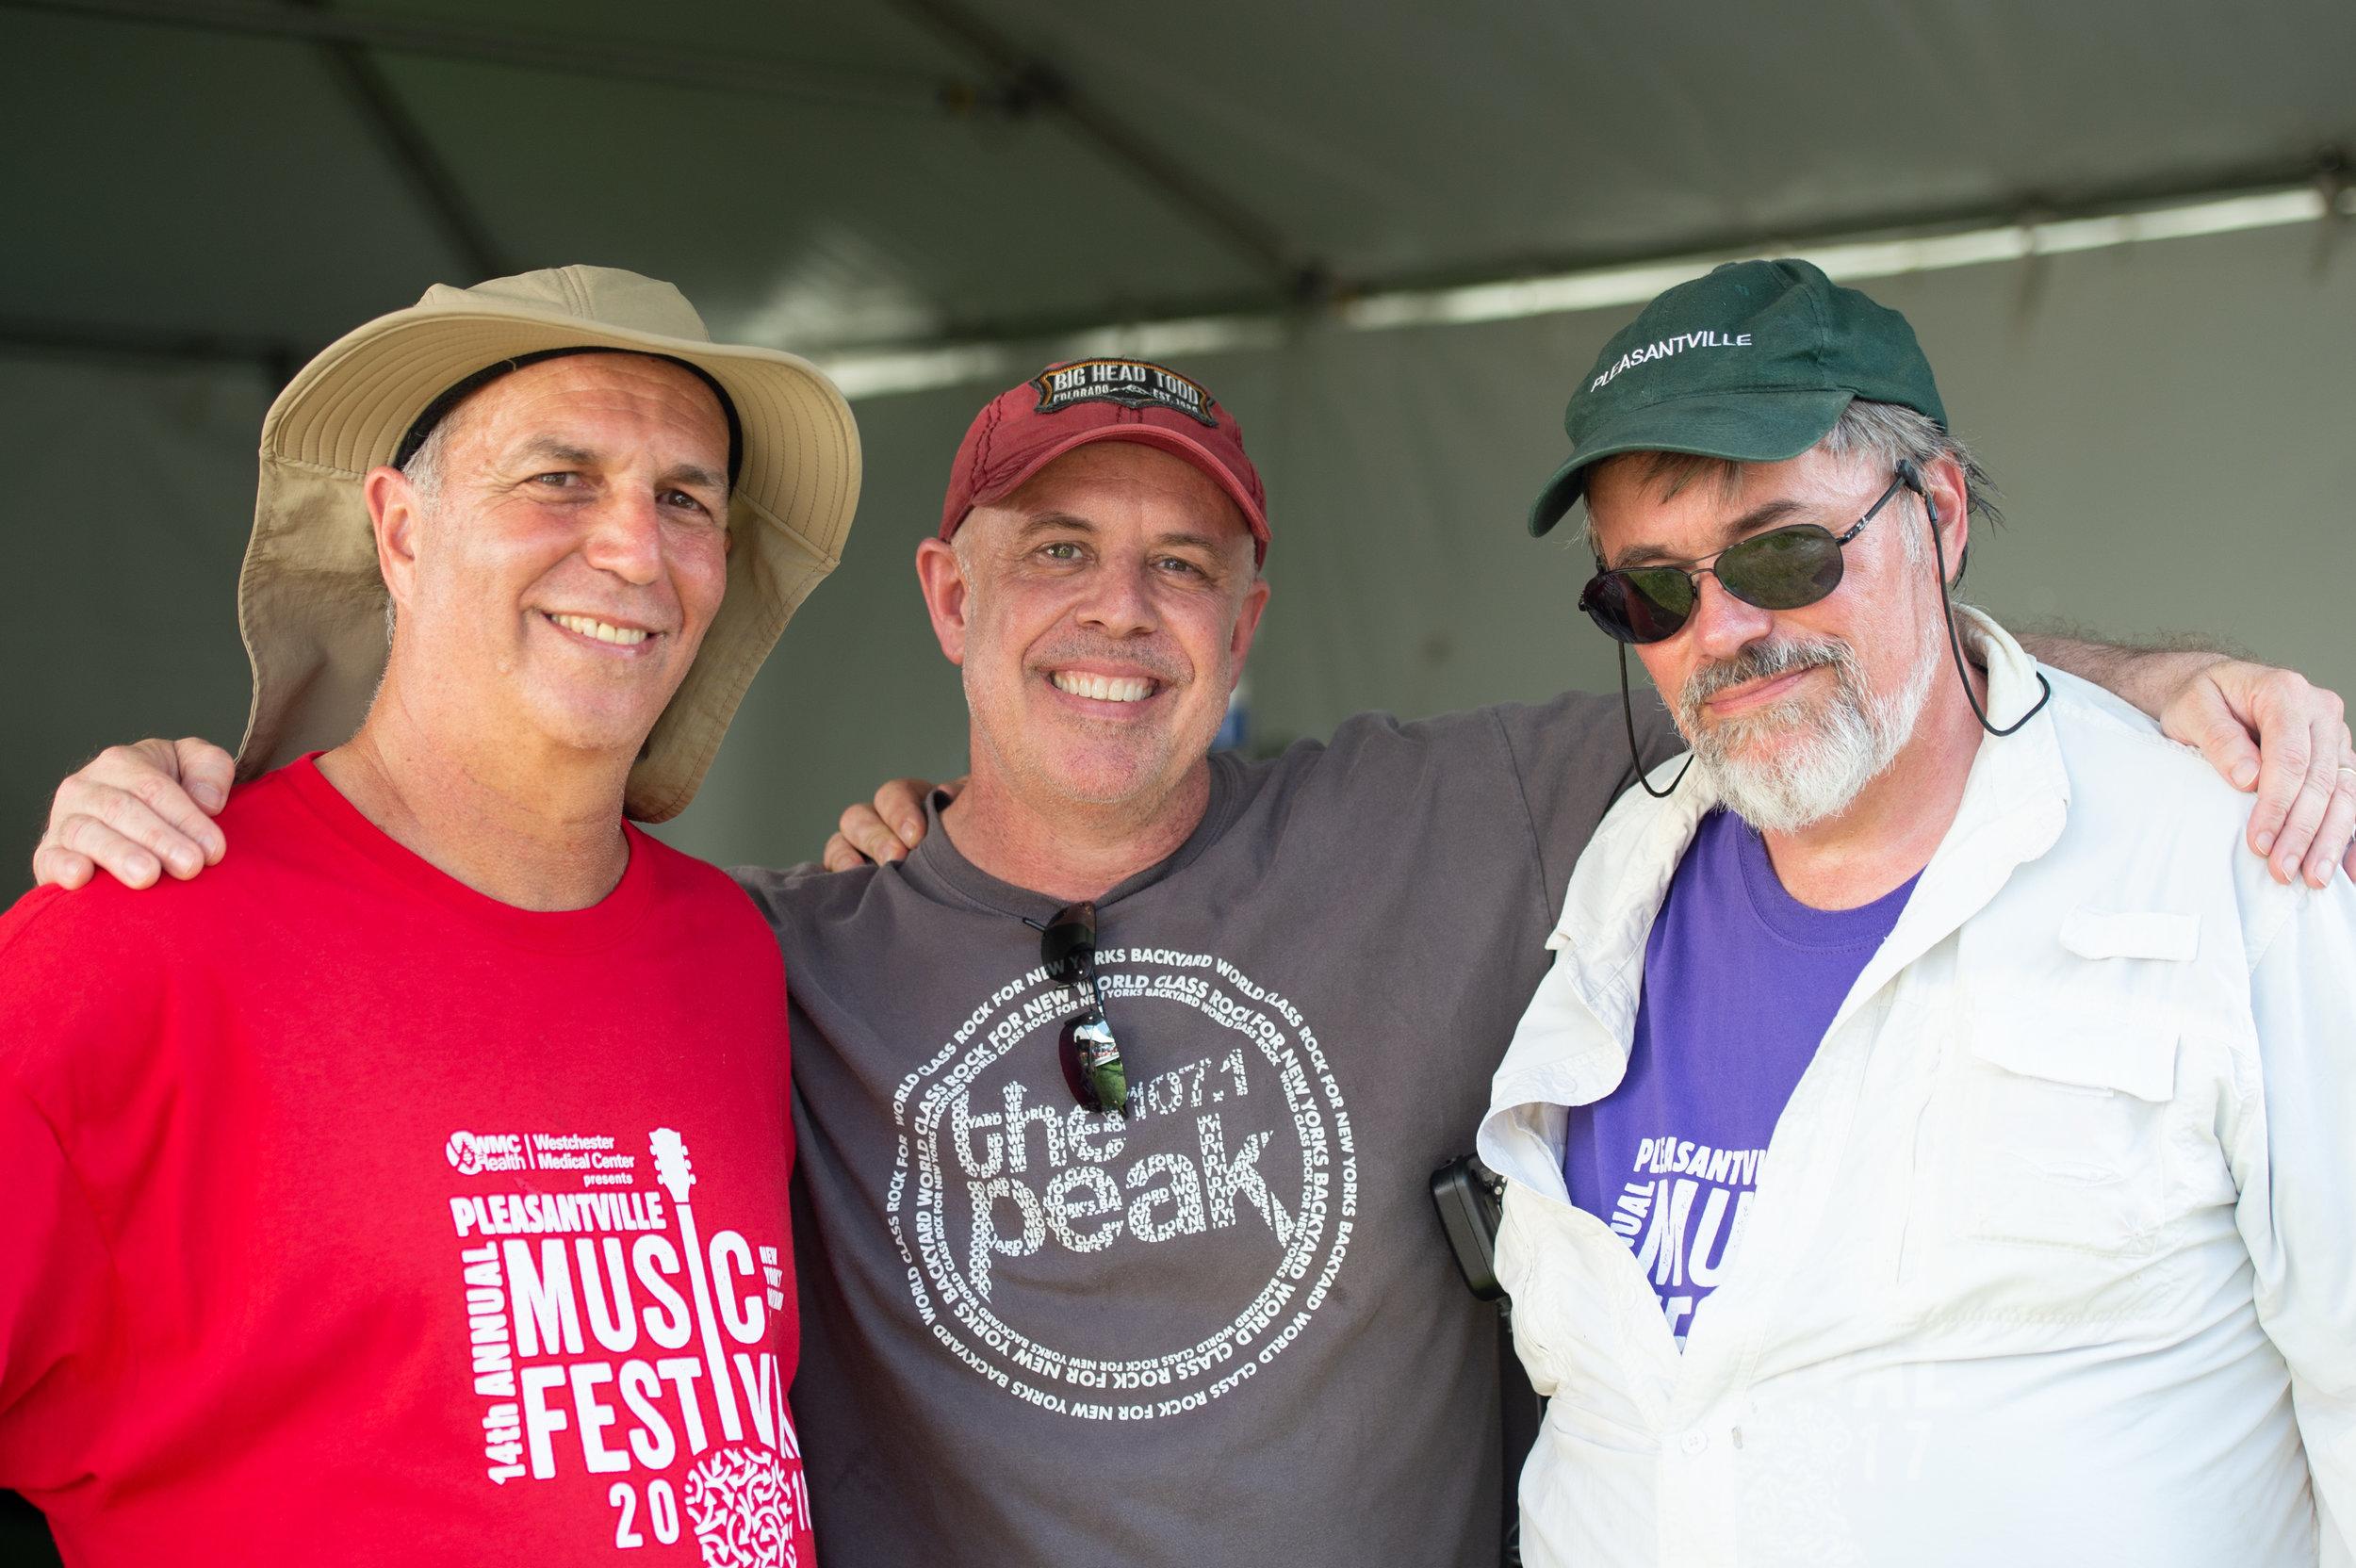 The trifecta, left to right: PMF Director Bruce Figler, Peak Program Director Chris Herrmann, Pleasantville Mayor Peter Scherer